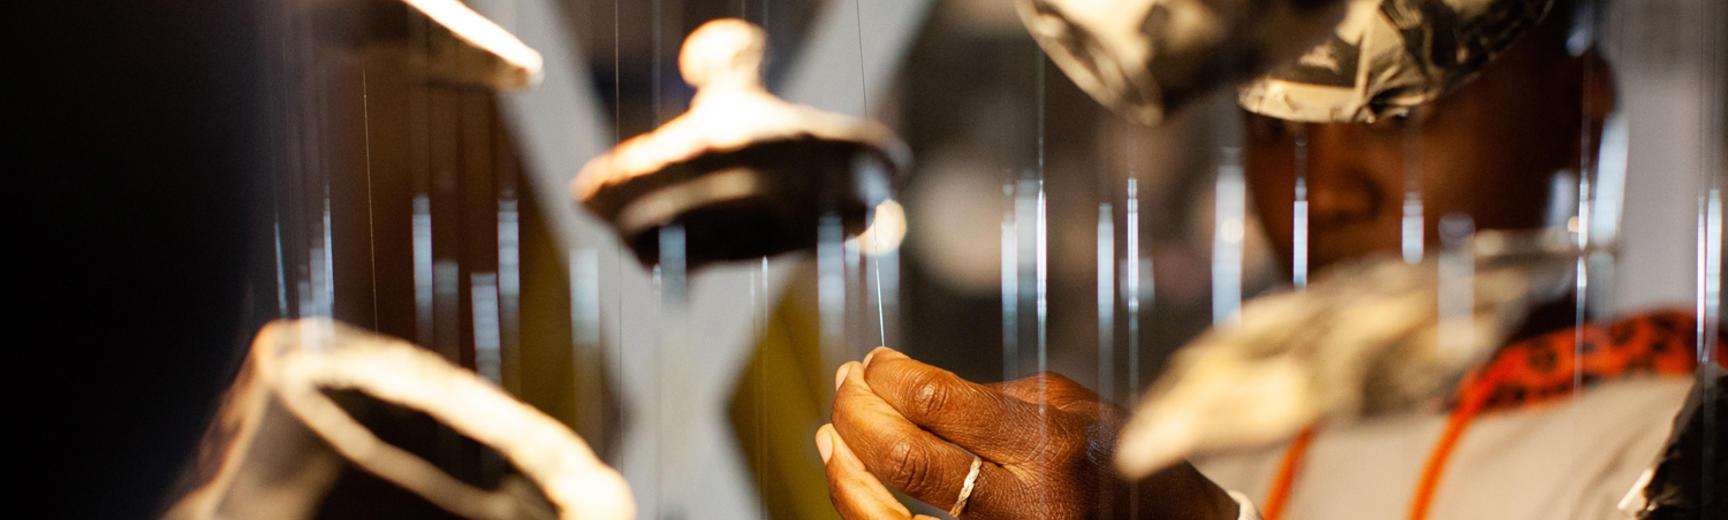 A Nice Cup of Tea? Contemporary Art Installation